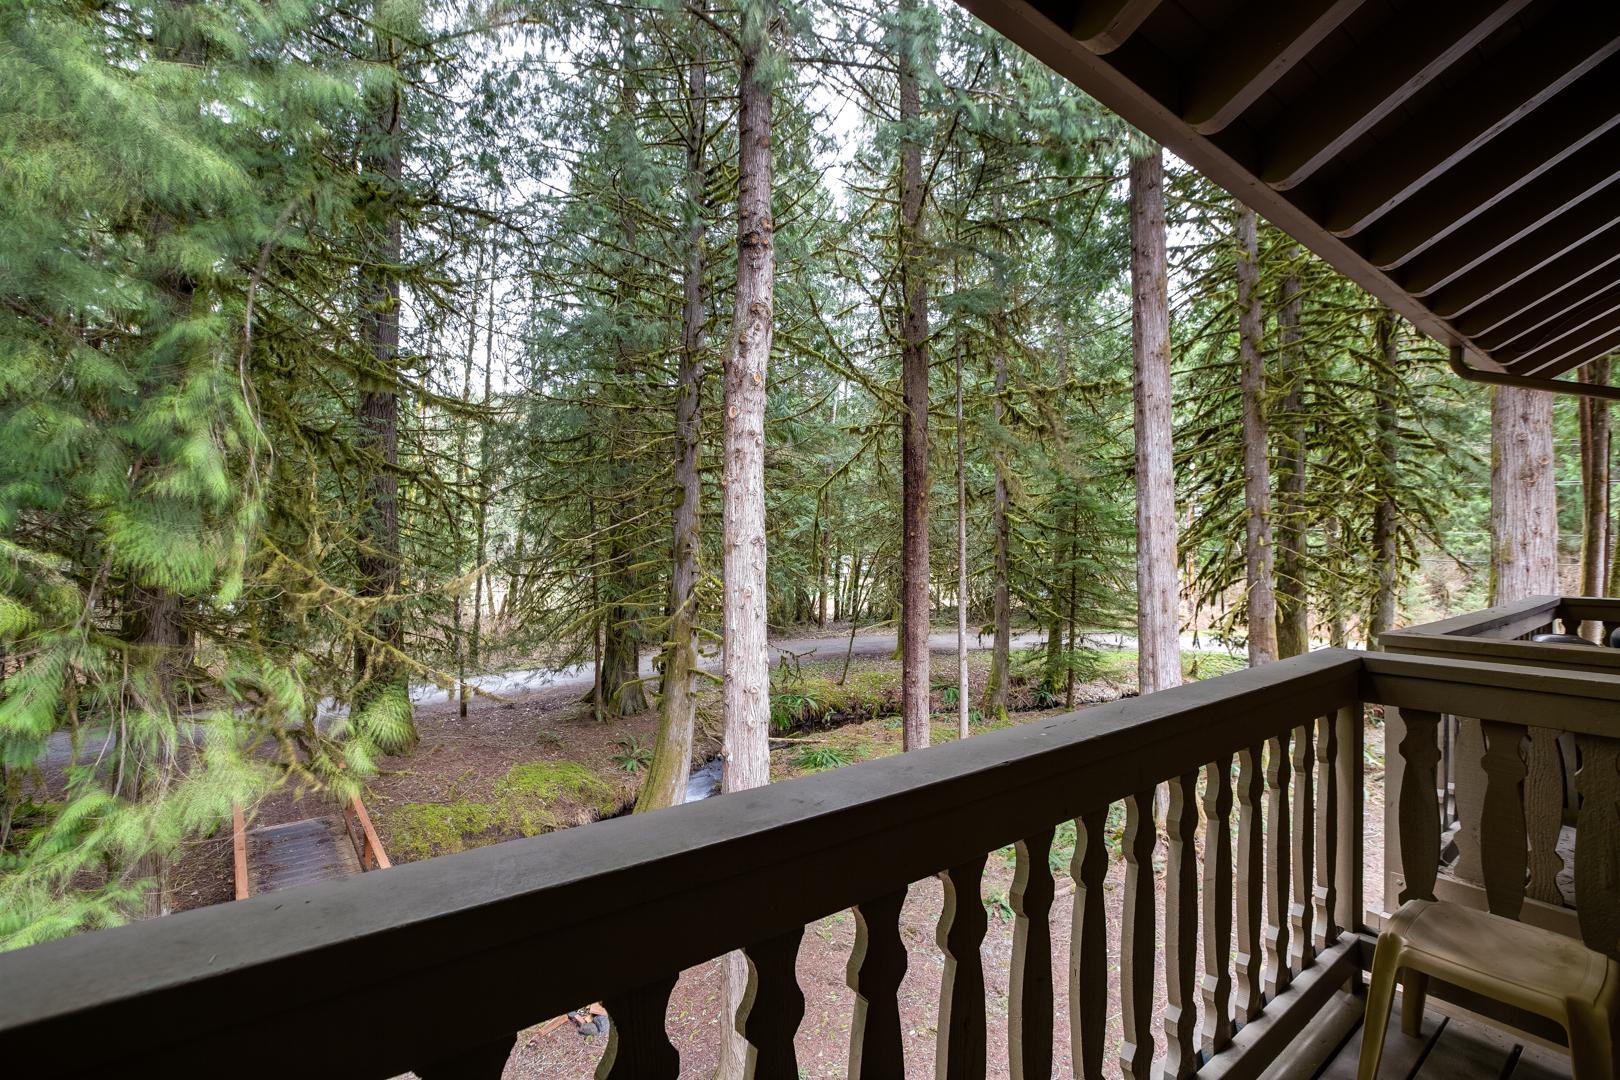 Apartment Mt  Baker Lodging Condo  56     FIREPLACE  INEXPENSIVE  KITCHENETTE  WIFI  SLEEPS-4  photo 31816883